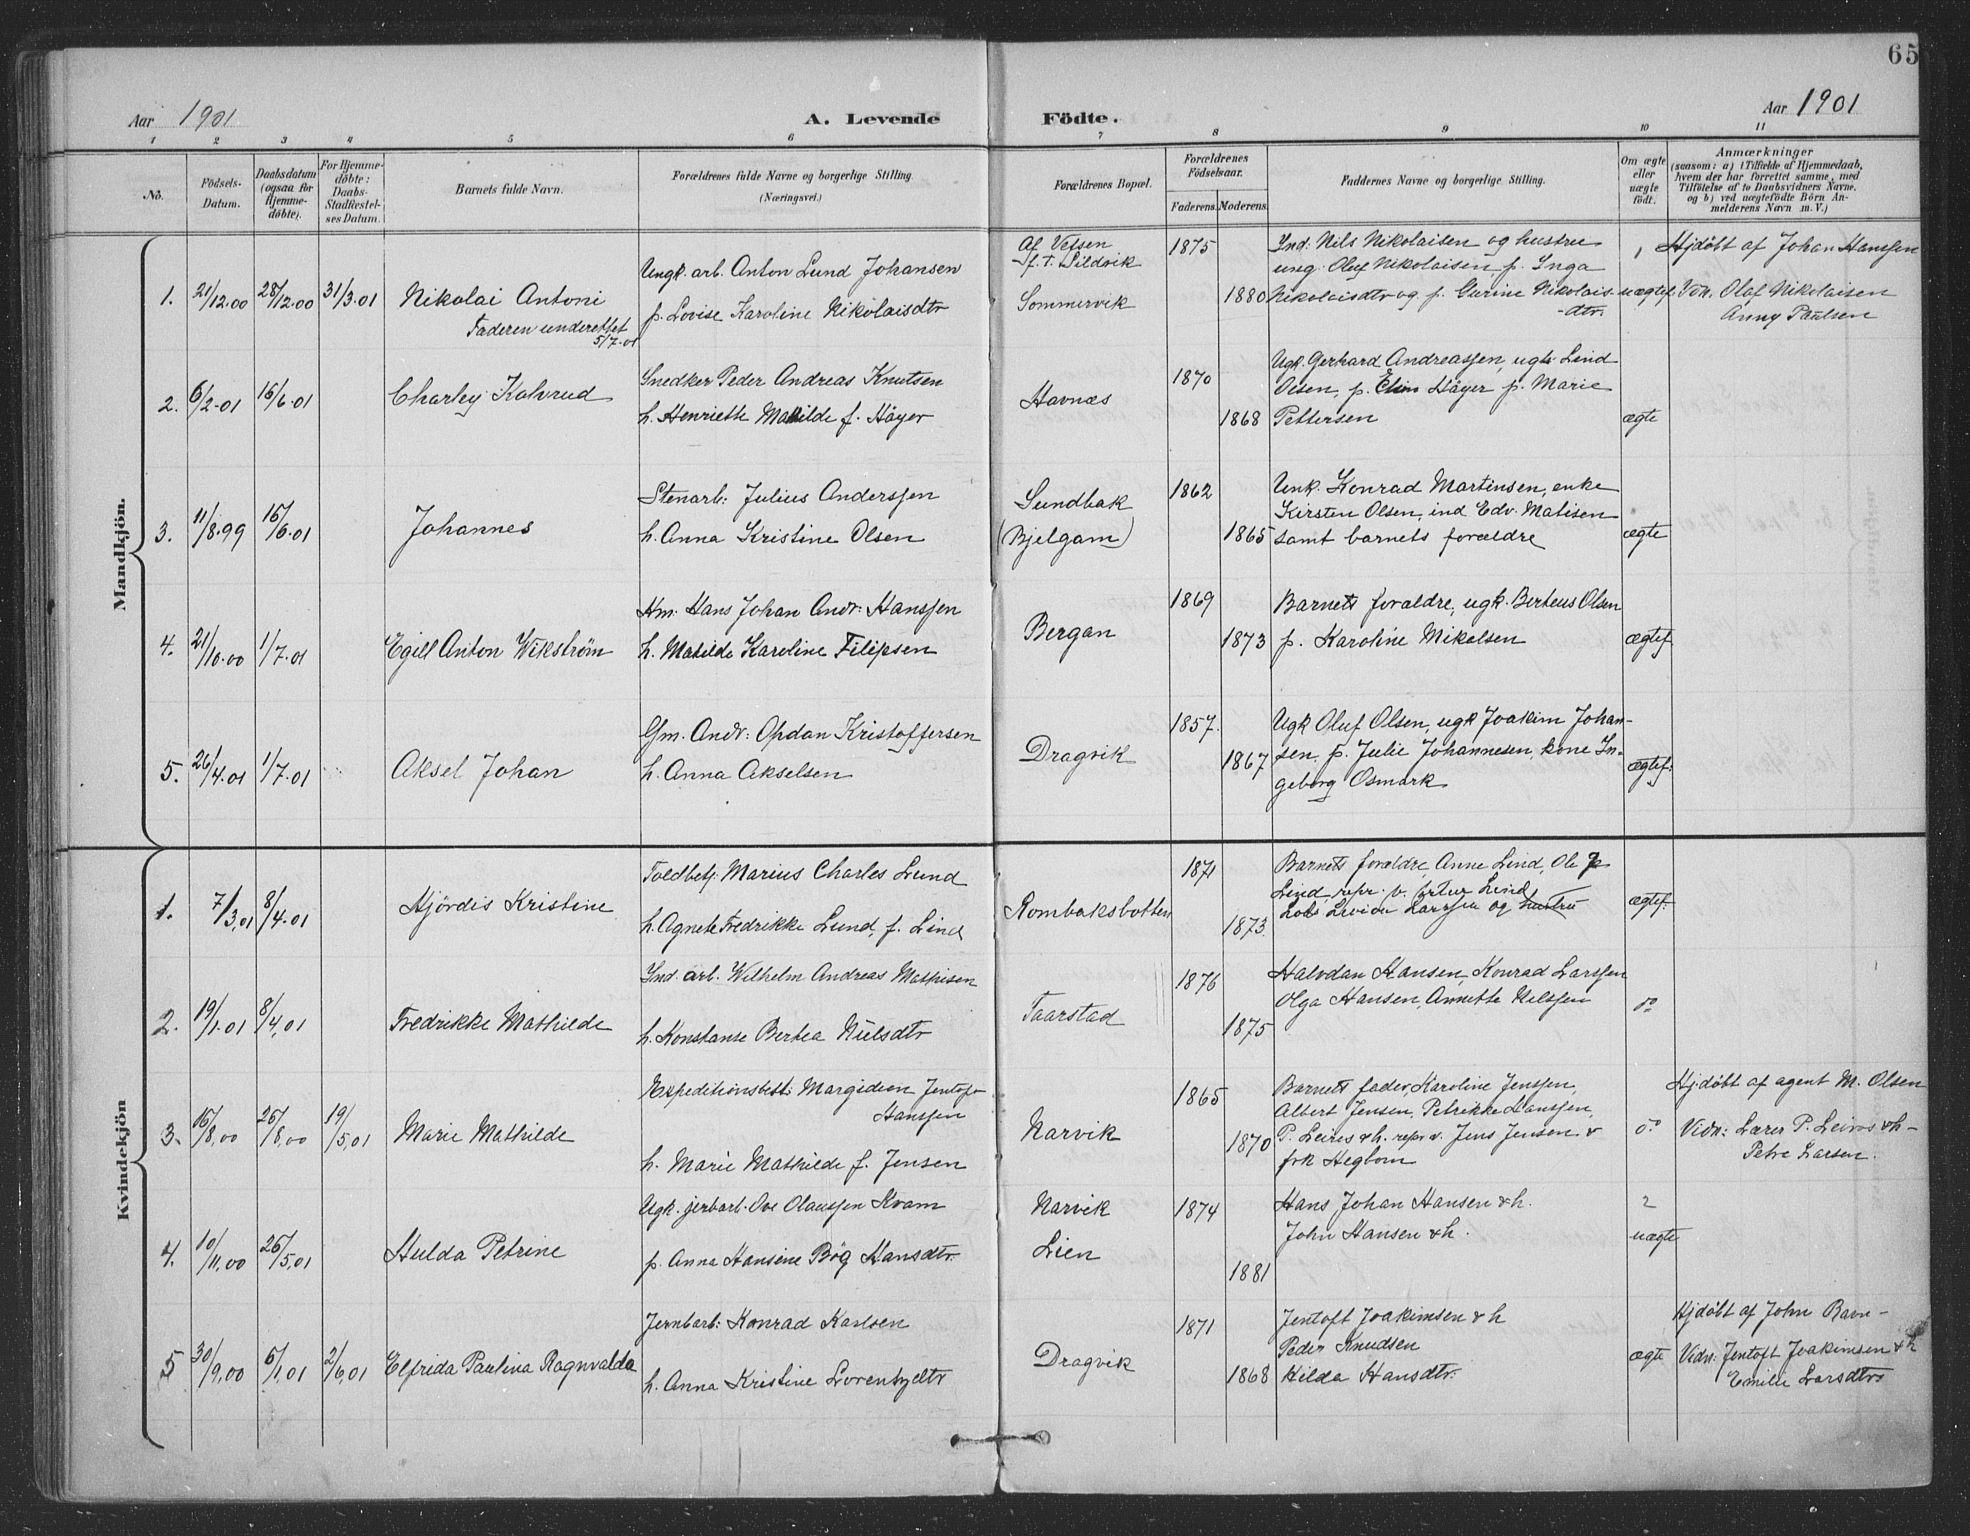 SAT, Ministerialprotokoller, klokkerbøker og fødselsregistre - Nordland, 863/L0899: Ministerialbok nr. 863A11, 1897-1906, s. 65